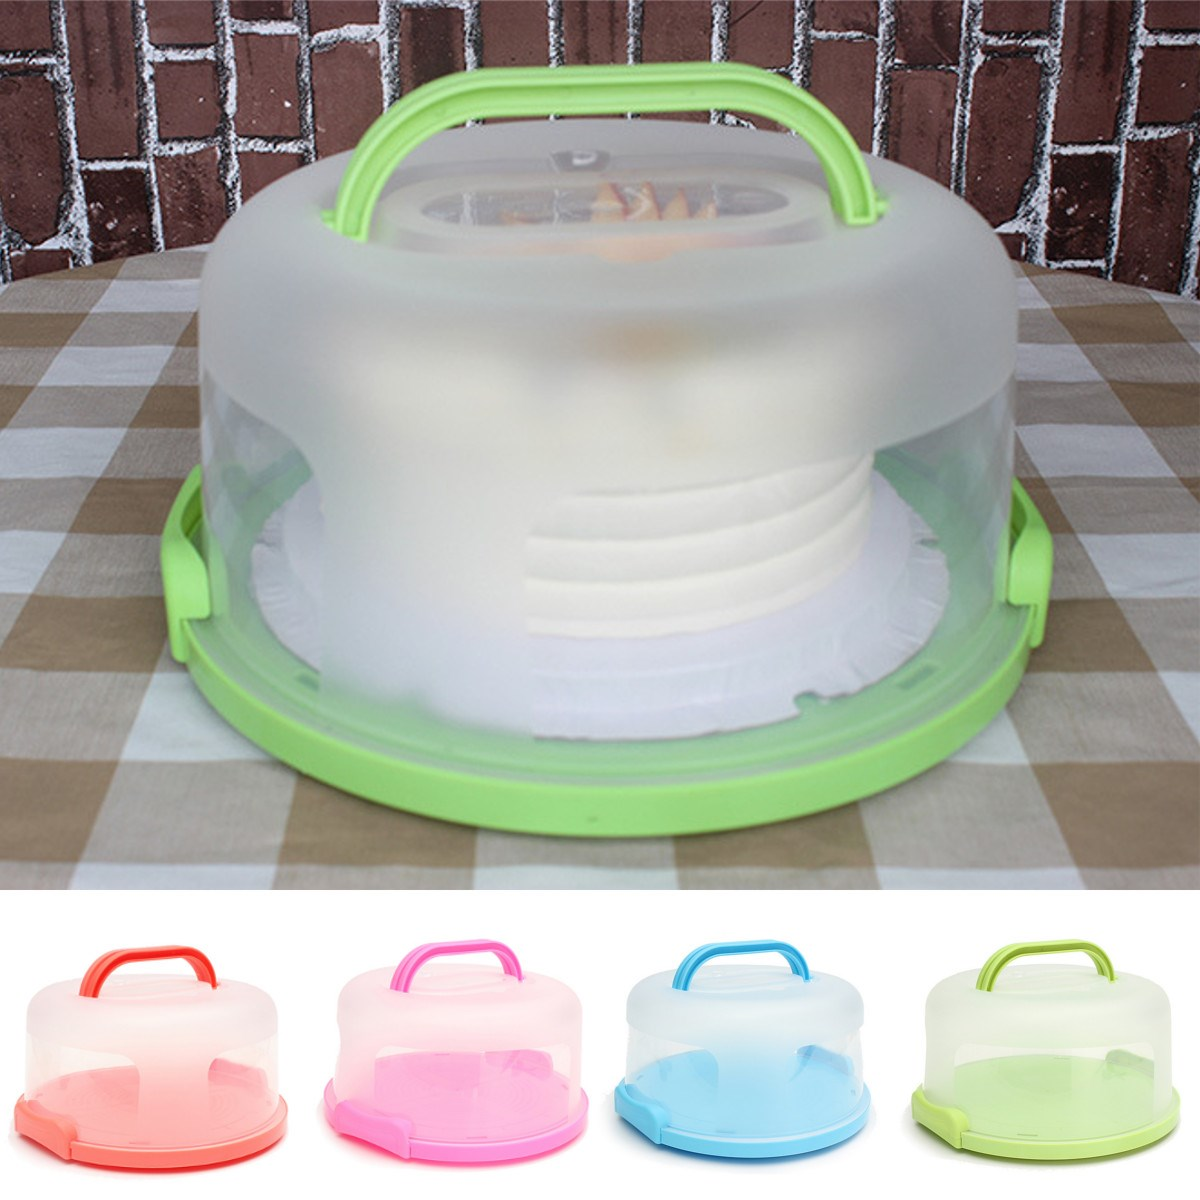 4 Colors Handheld Round Cake Carrier Plastic Storage ...